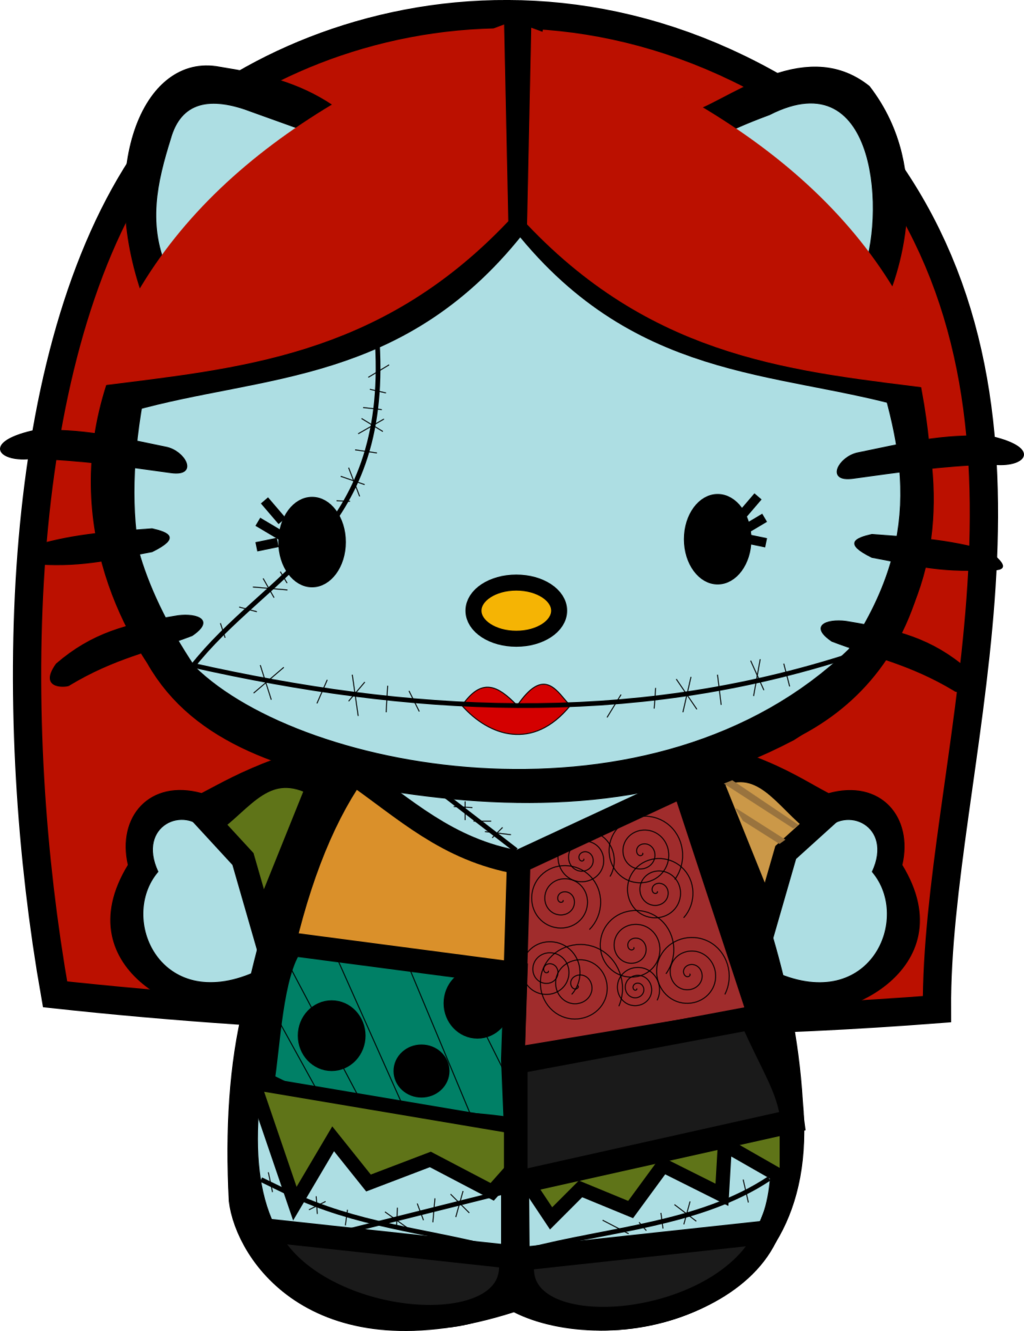 Sweet Hello Kitty Clip Art. - Oh My Fiesta! in english